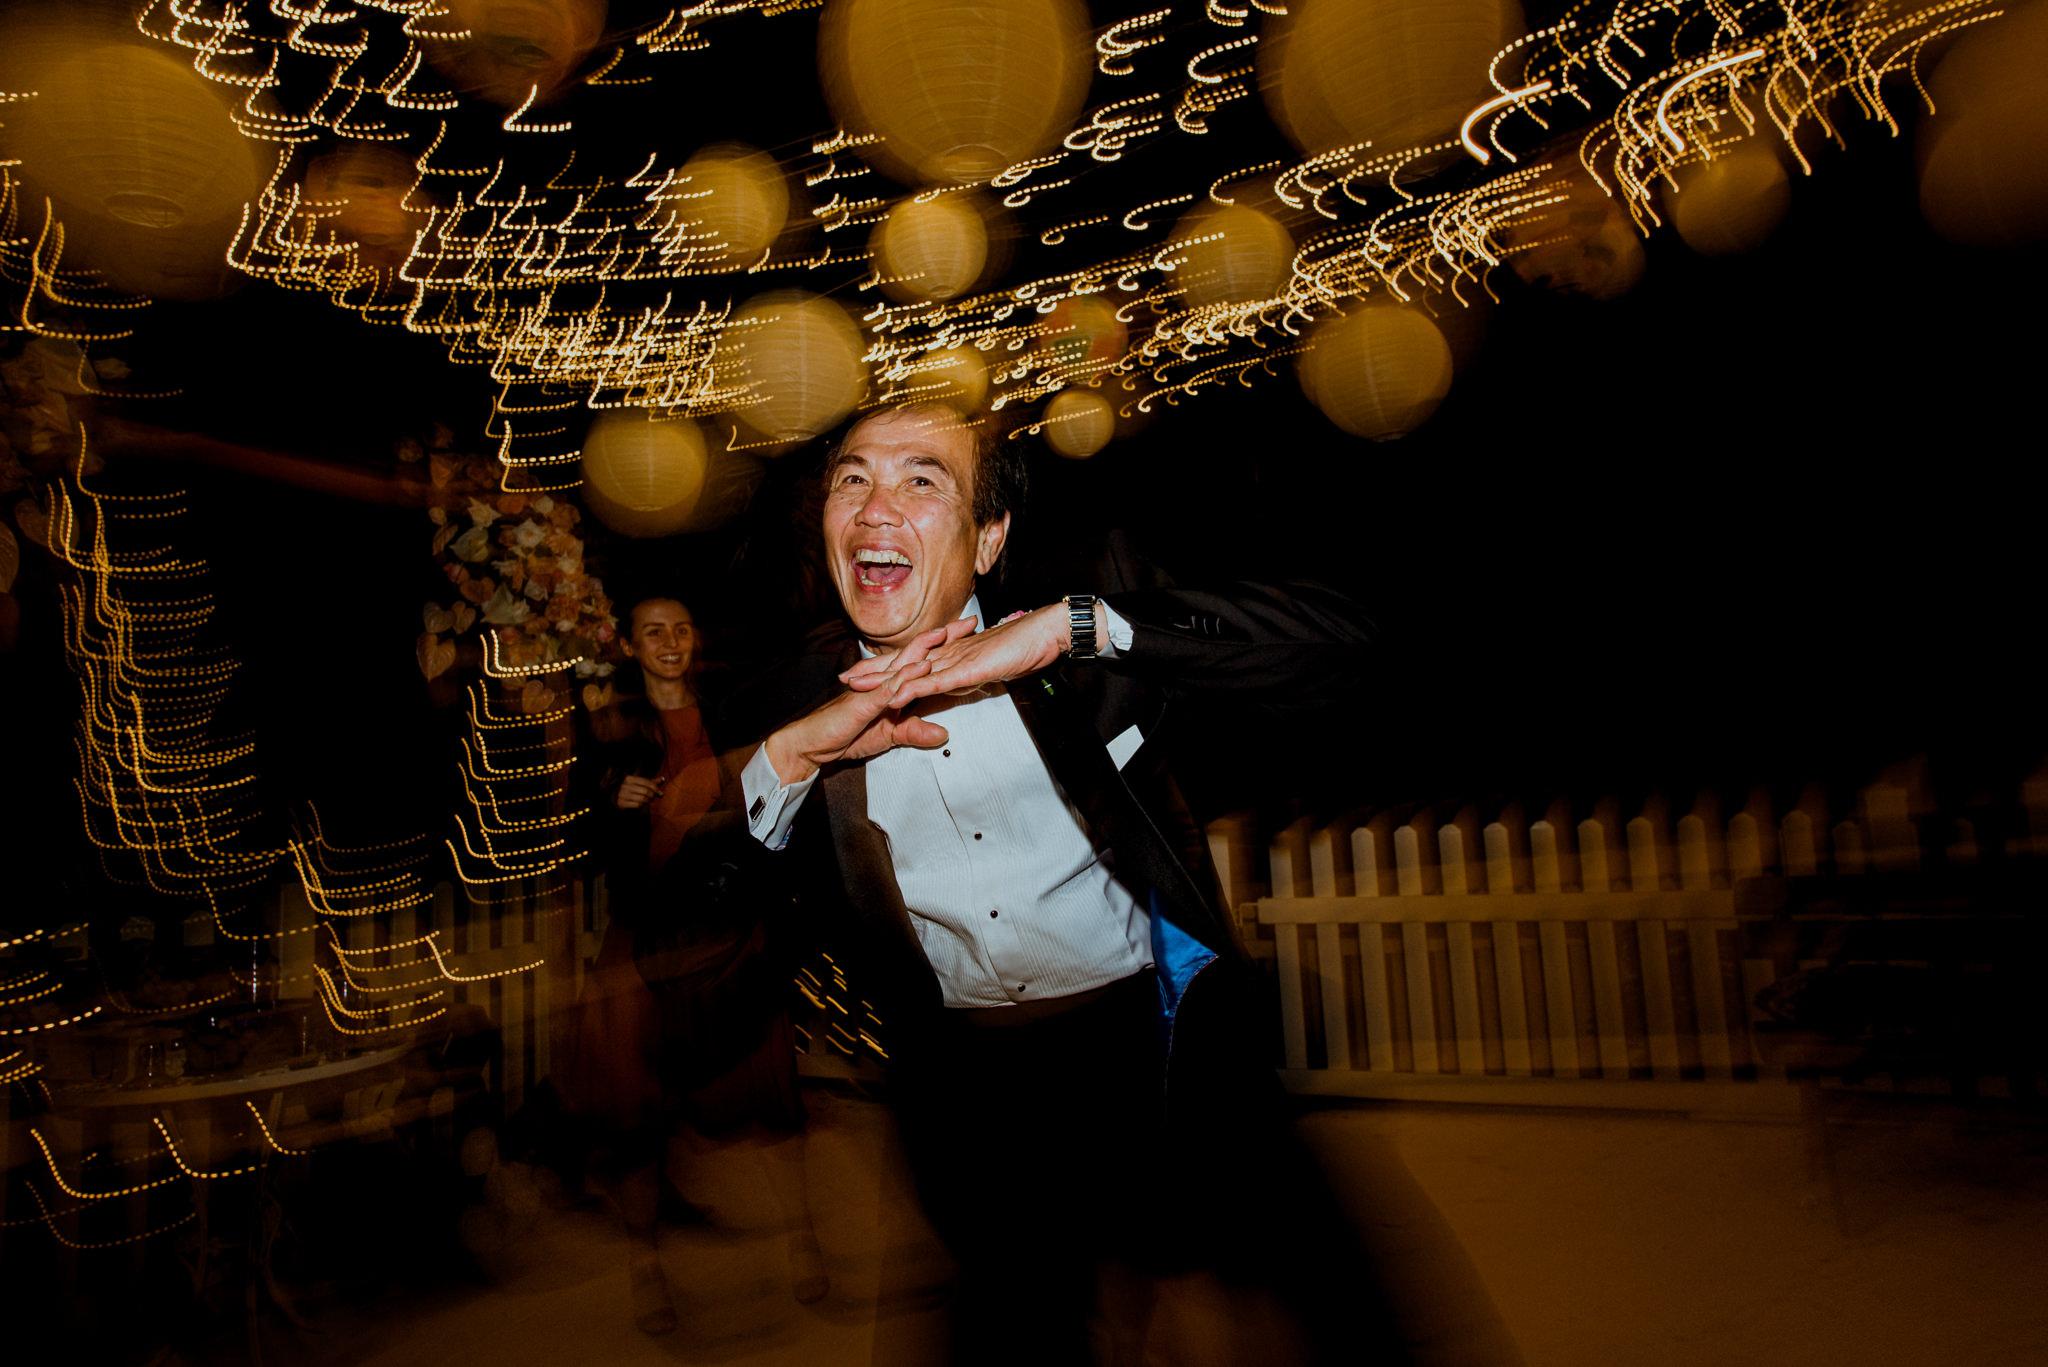 Party shot of a man dancing